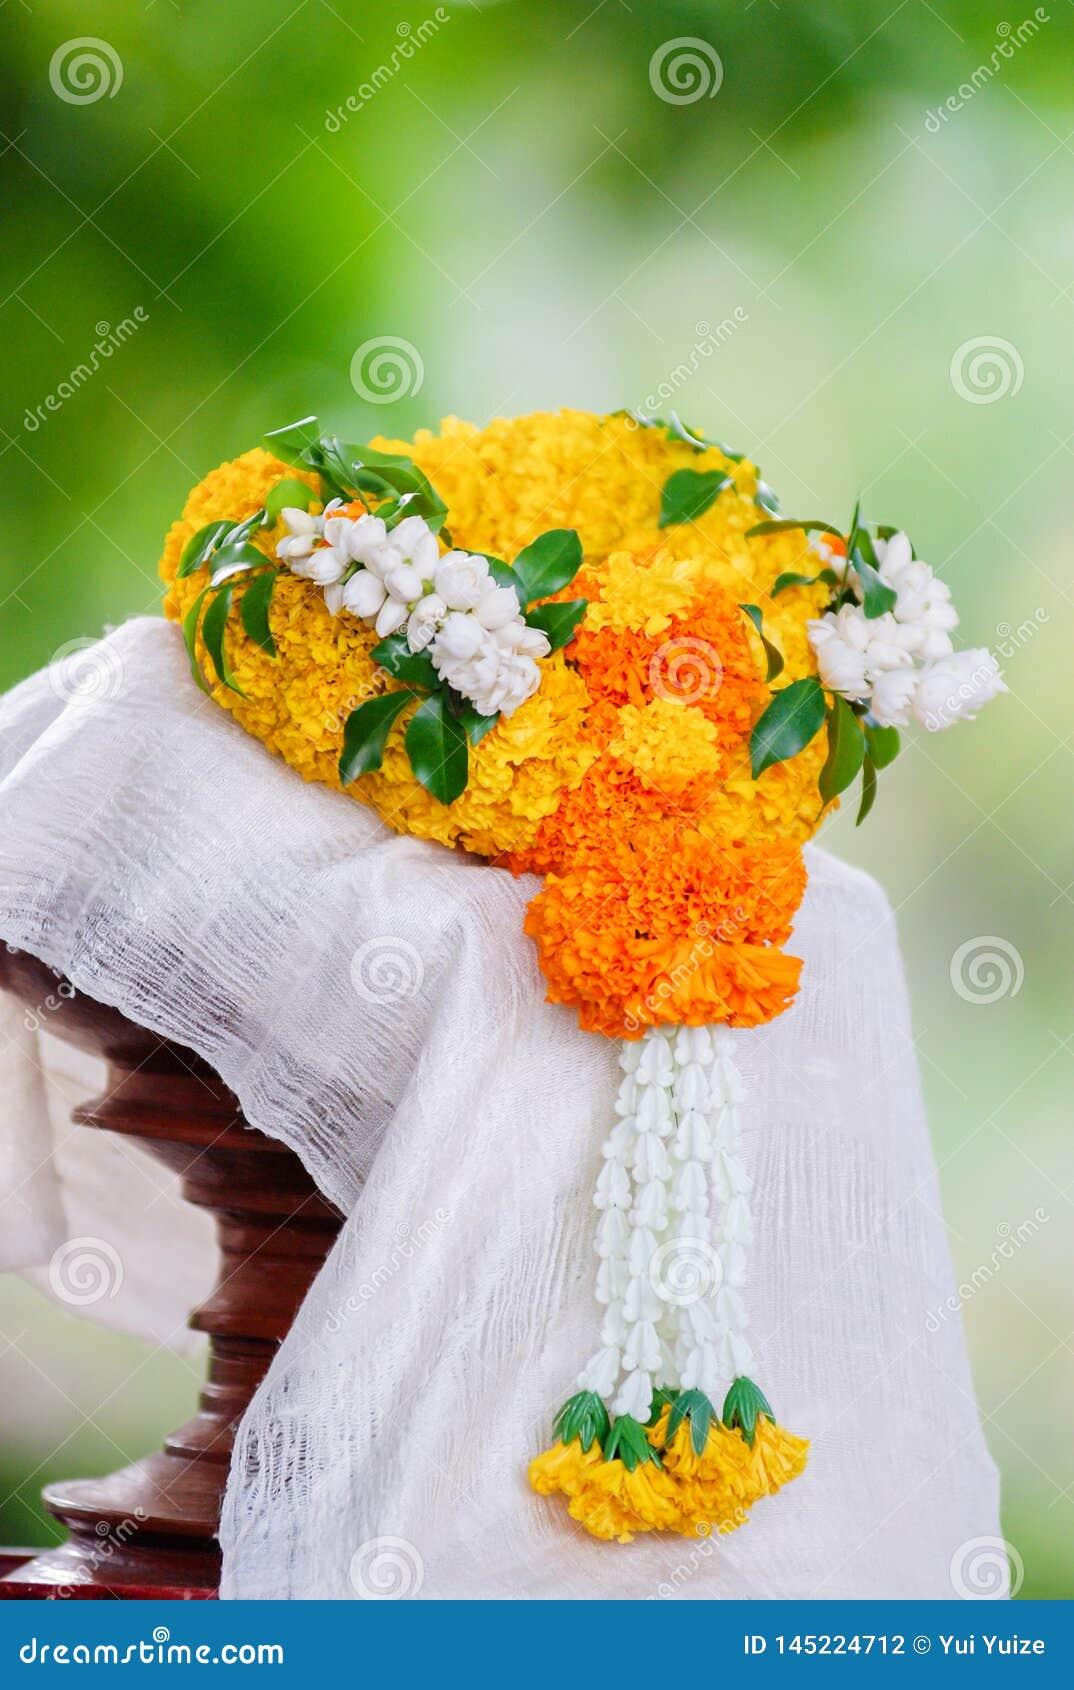 Marigold garland handcraft flowers.